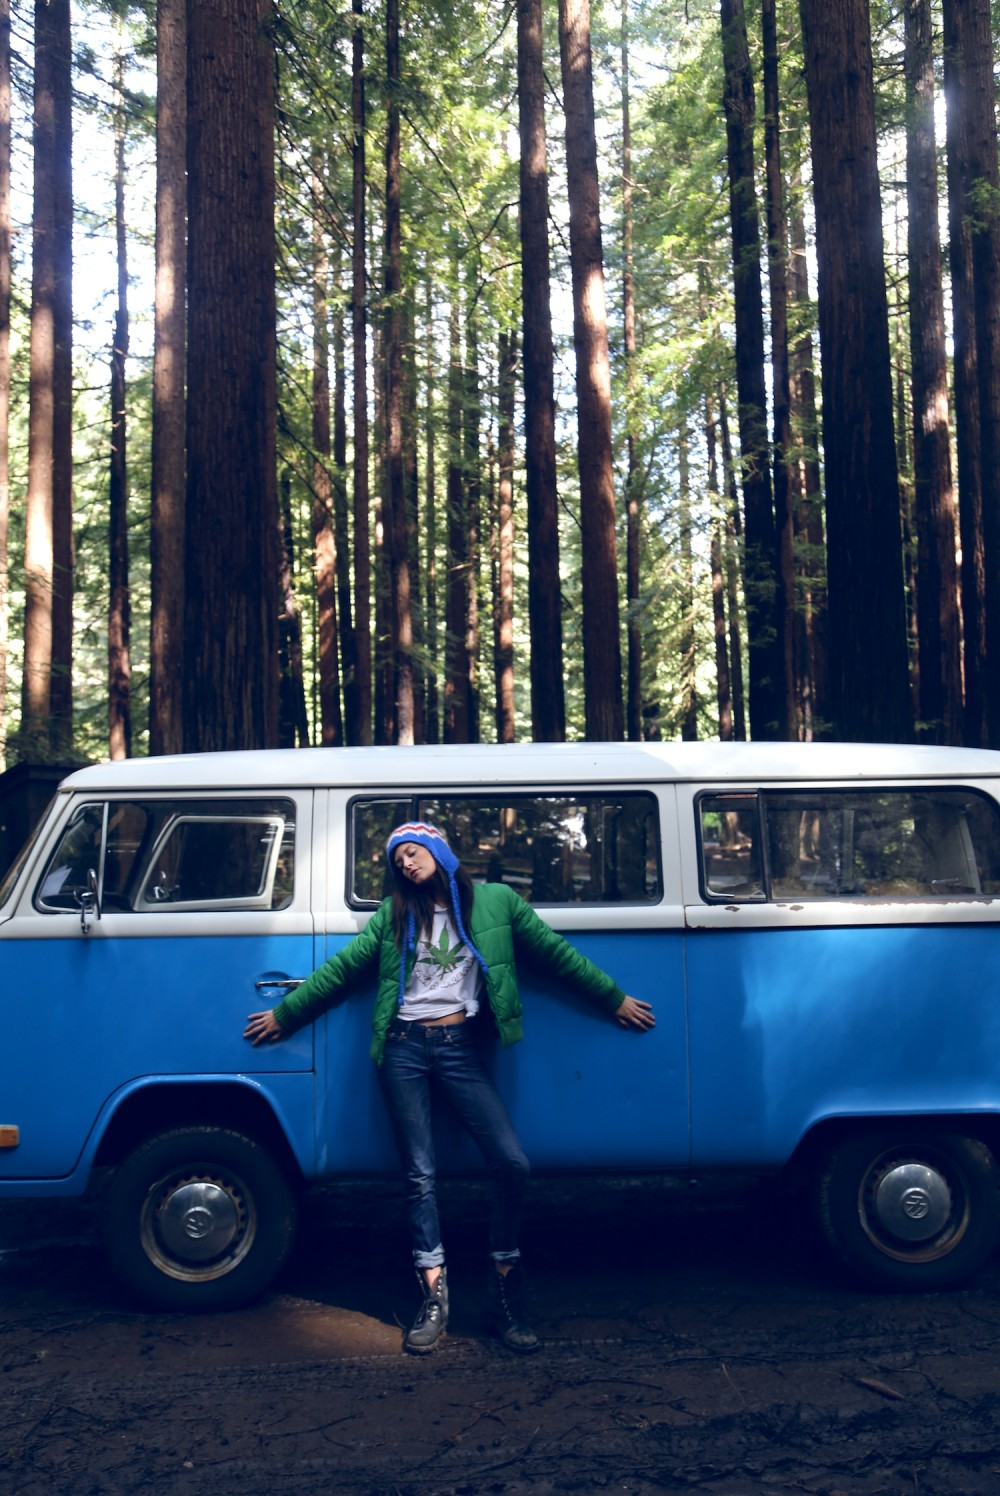 vw bus, vintage, camping, millennial, glamping, redwoods national park, lifestyle camping,heather van gaale, road trip,